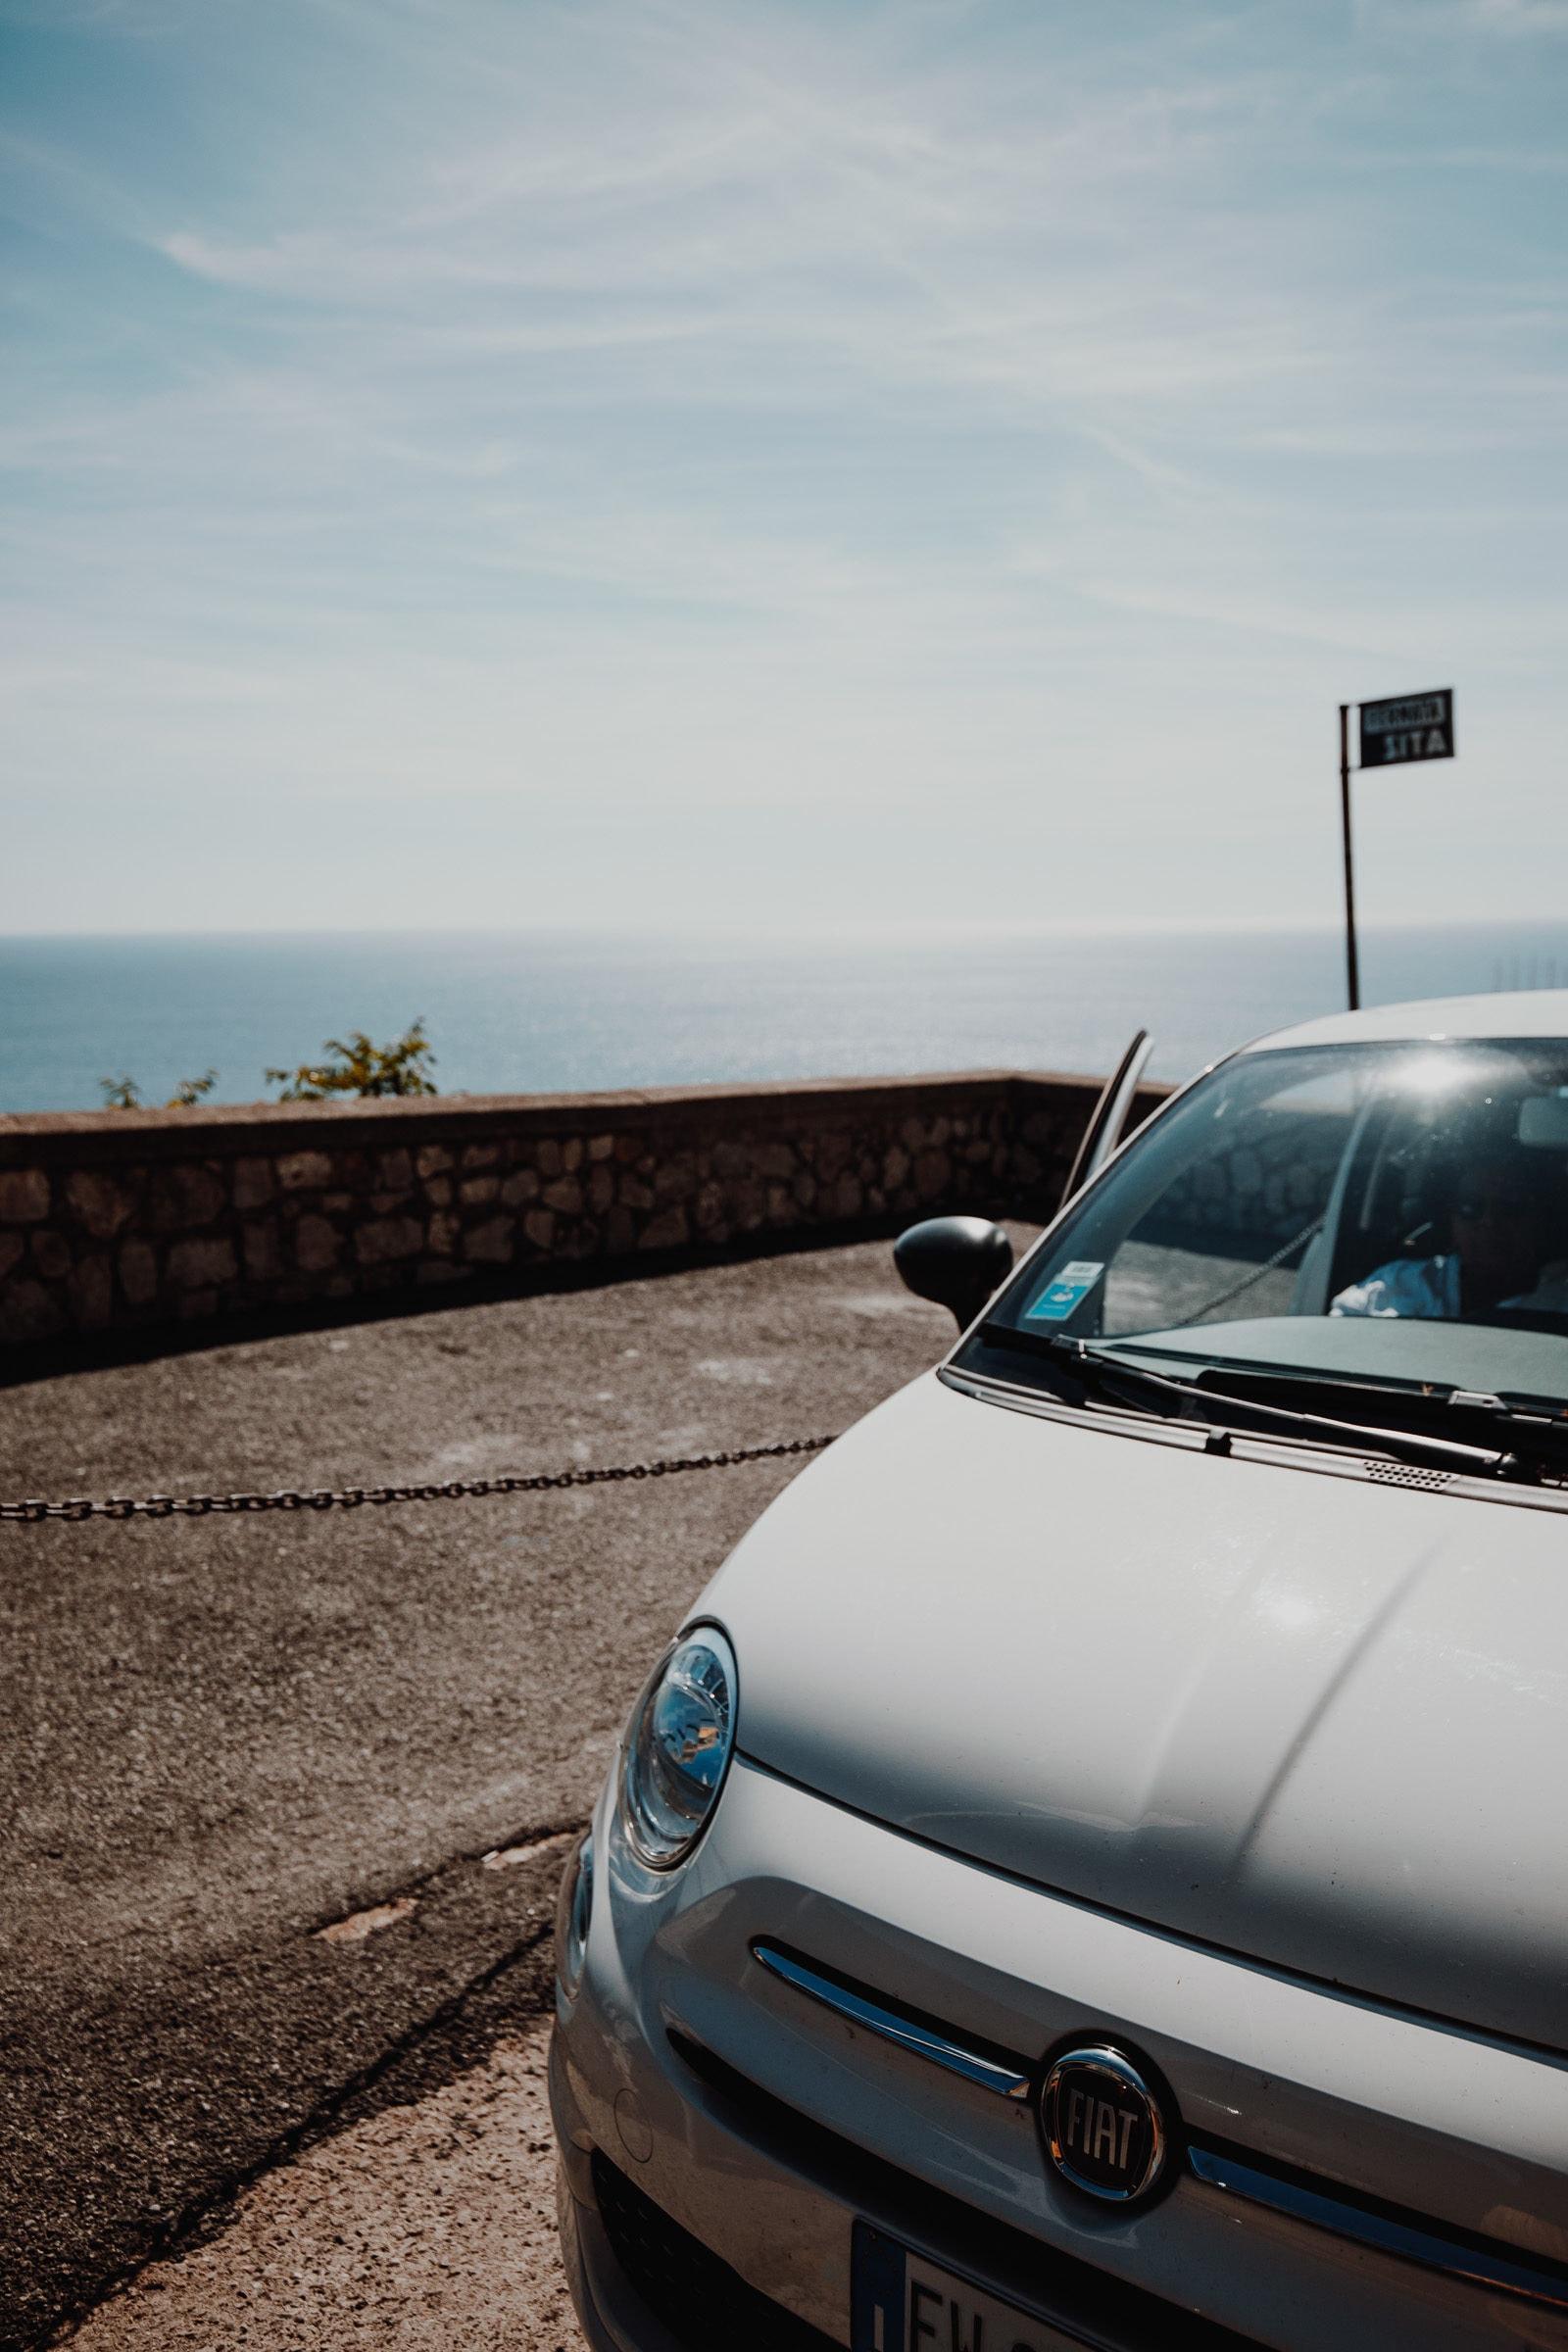 Amalfi Coast with a Fiat 500